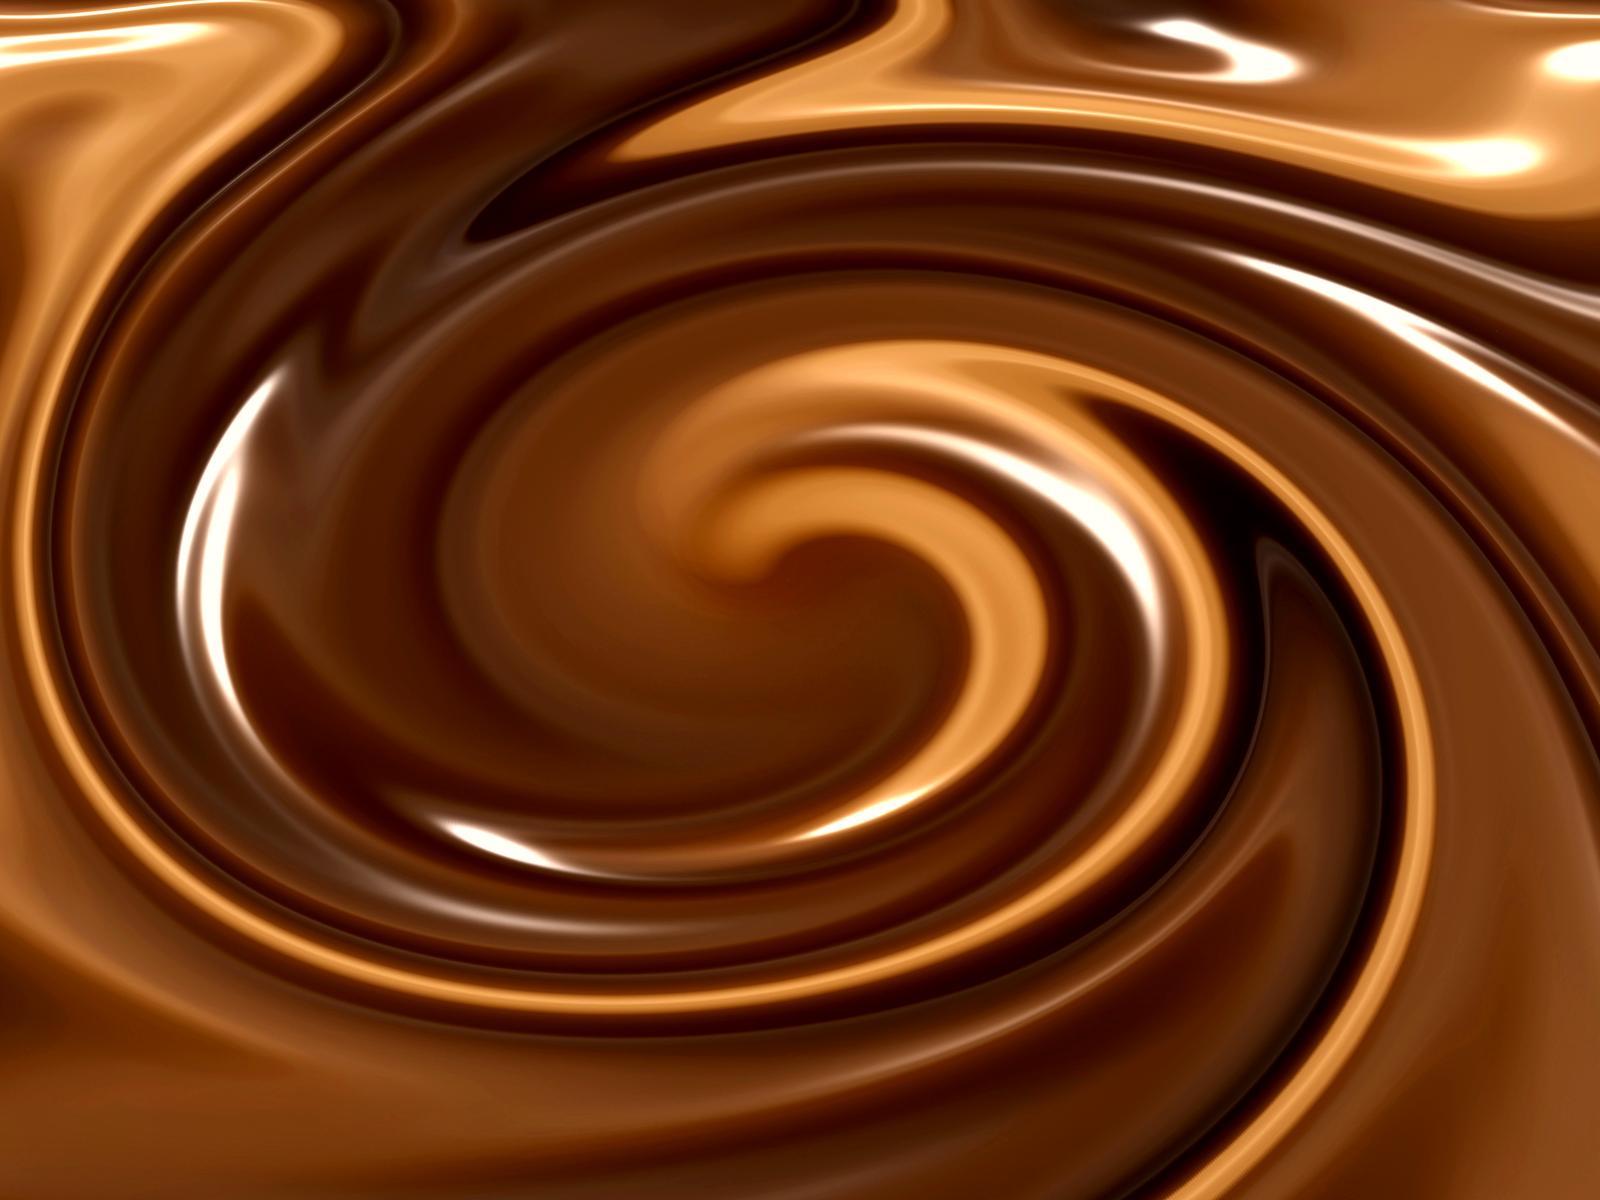 Chocolate Candy Wallpaper 33 Background Wallpaper   Hivewallpapercom 1600x1200